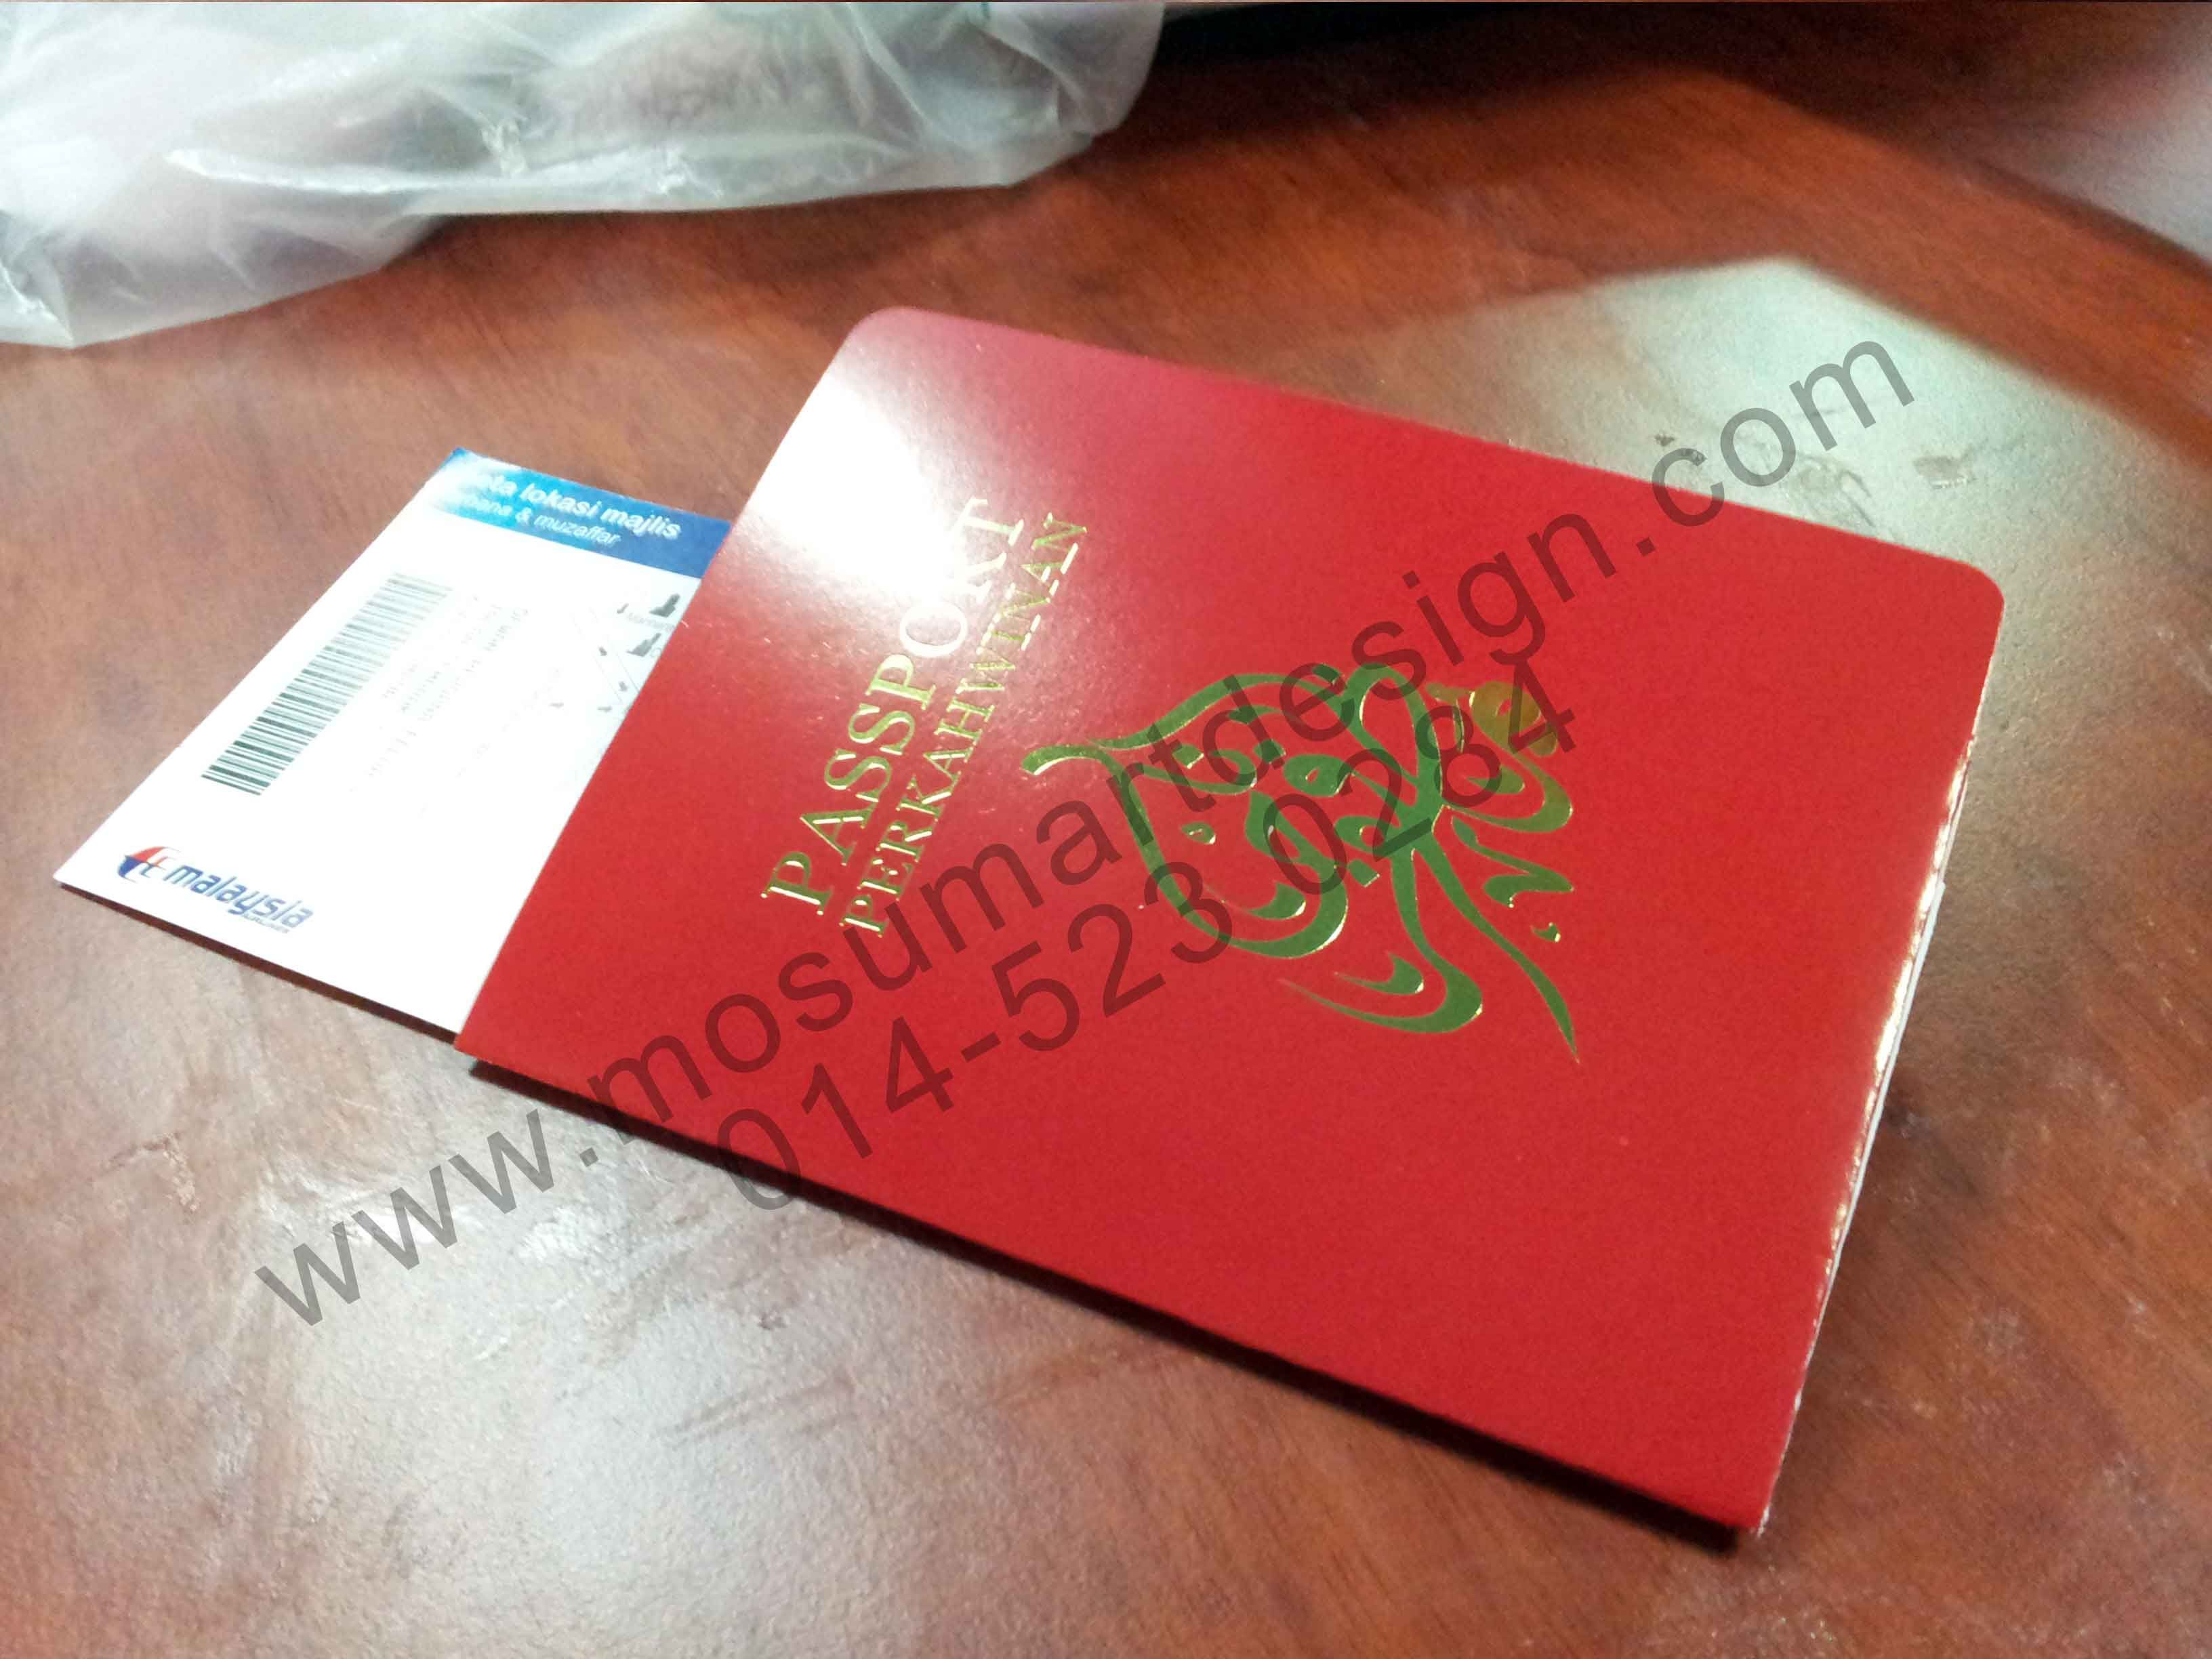 Eksklusif Untuk Anda Design2 Terkini Kadkahwin Jemputankadkahwin Www Mosumartdesign Com Info Lanjut Http Www Mos Packaging Design Design Kad Kahwin